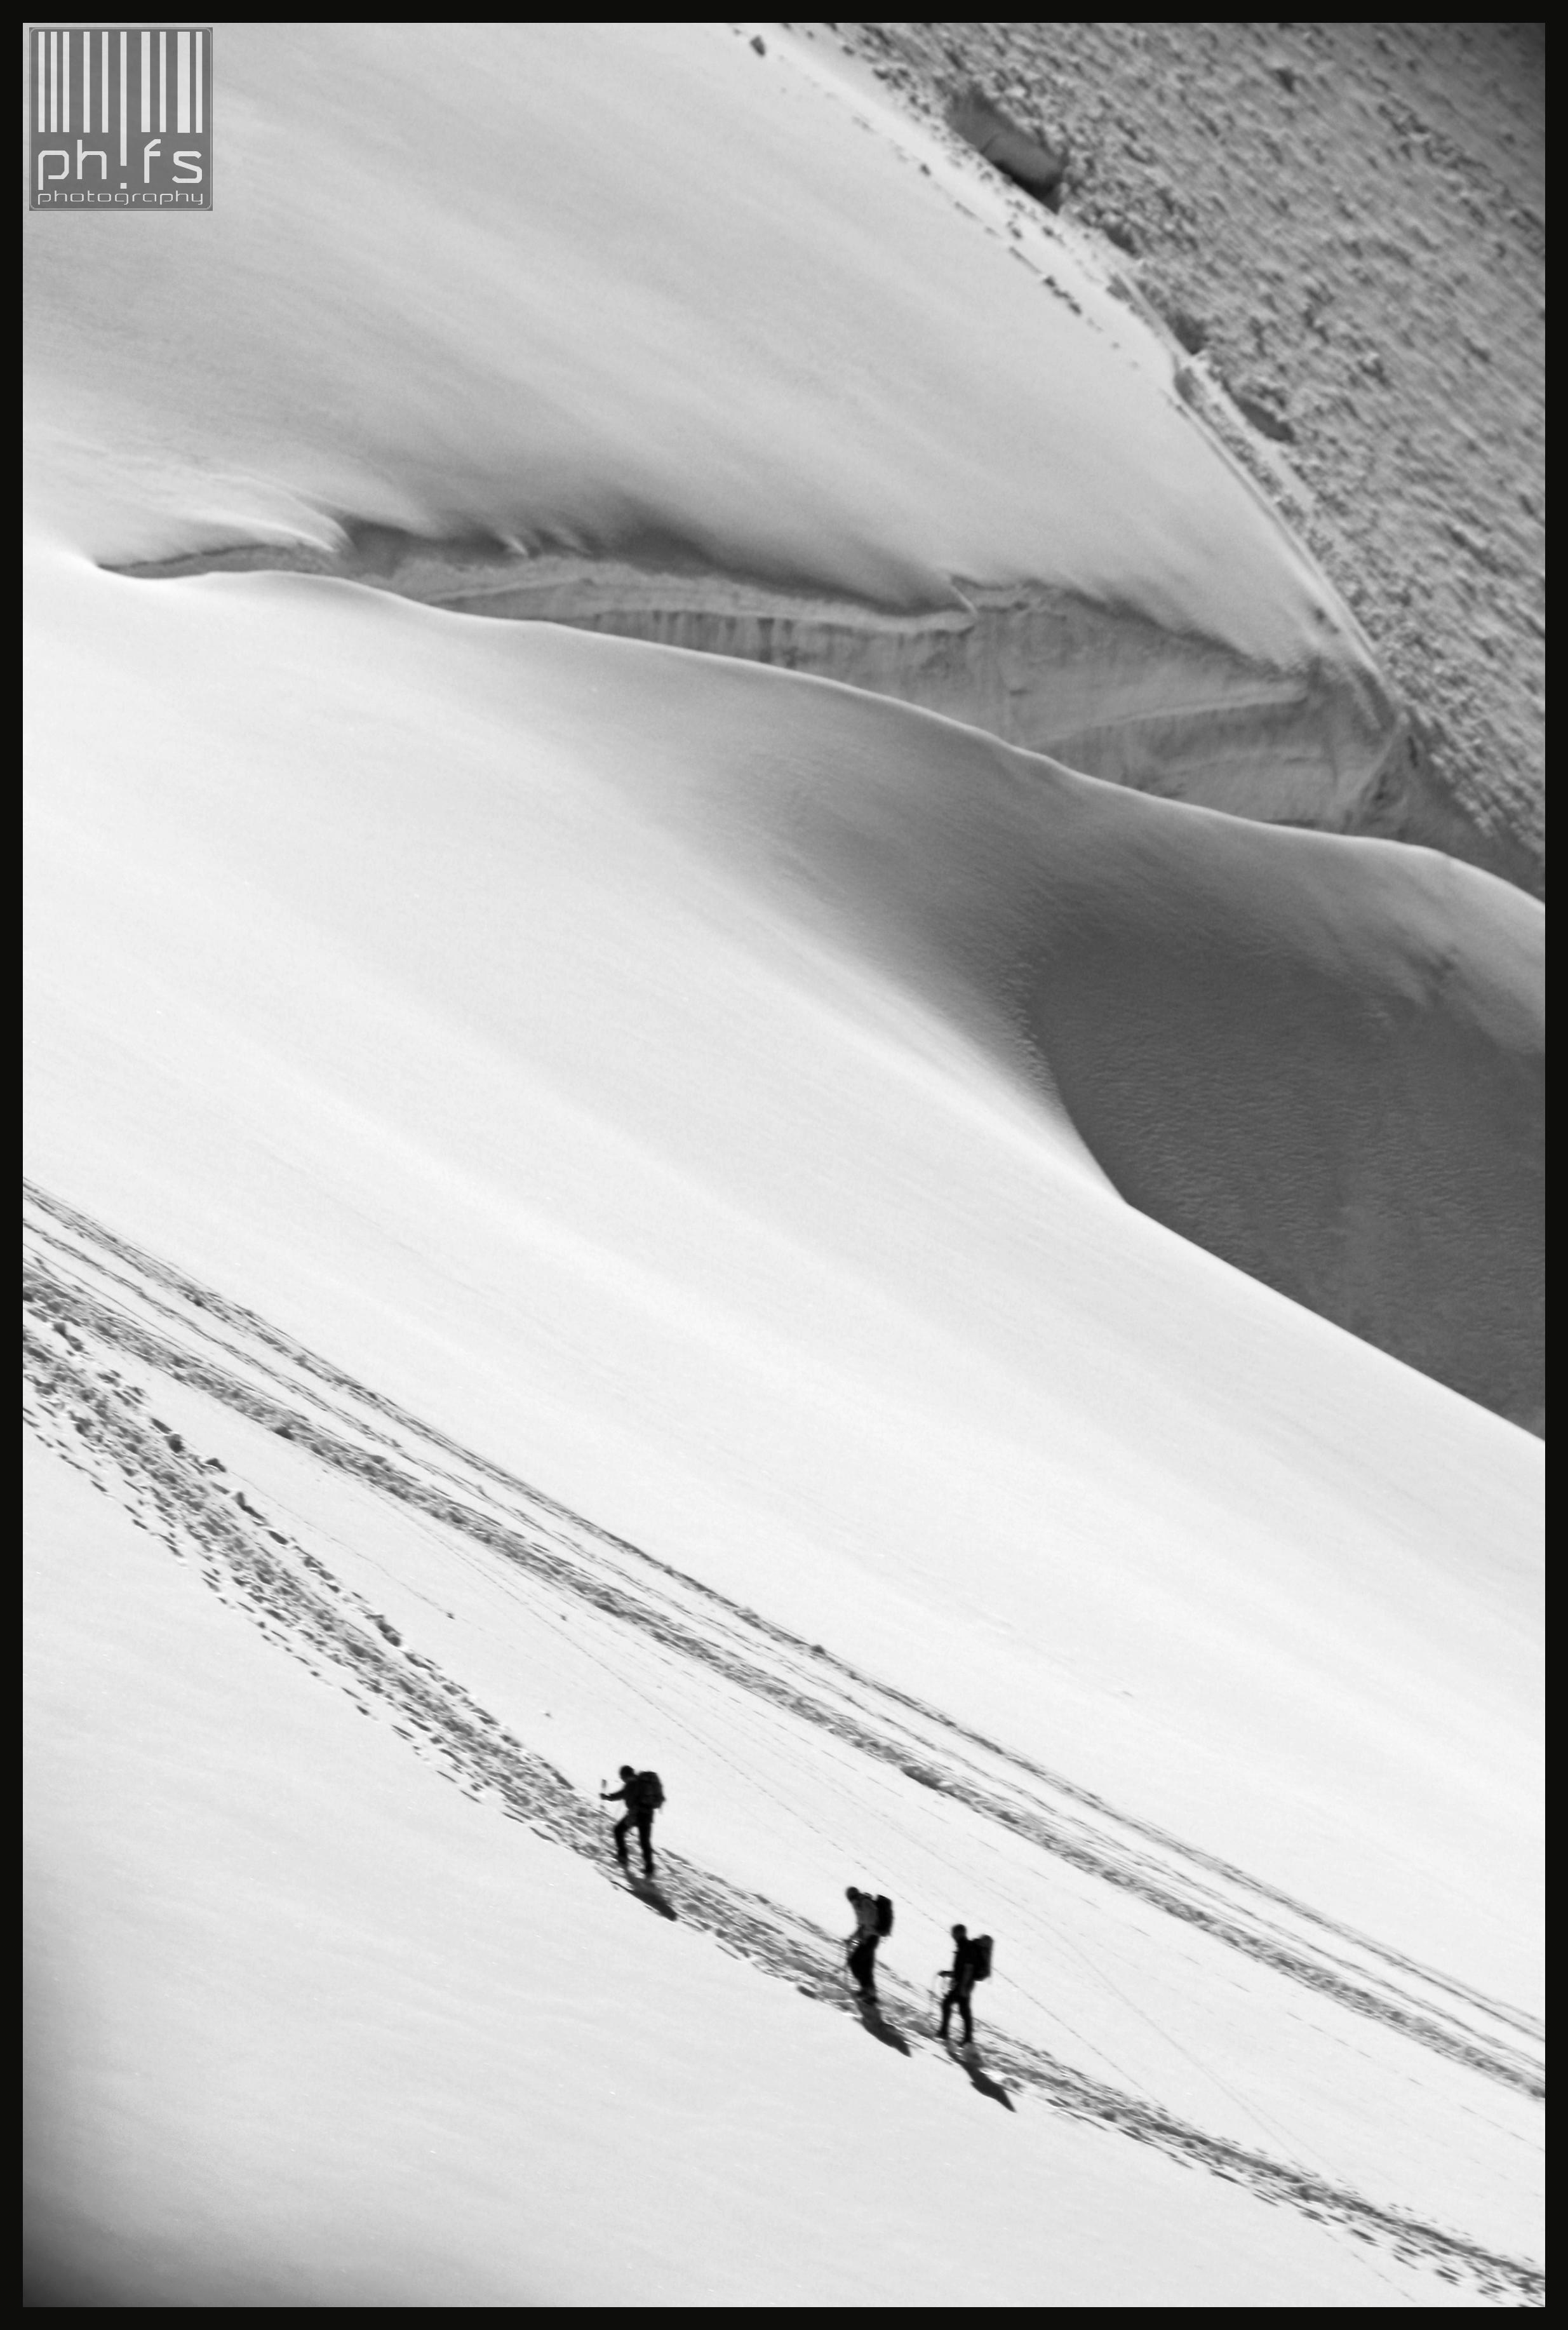 Monte Bianco 2014